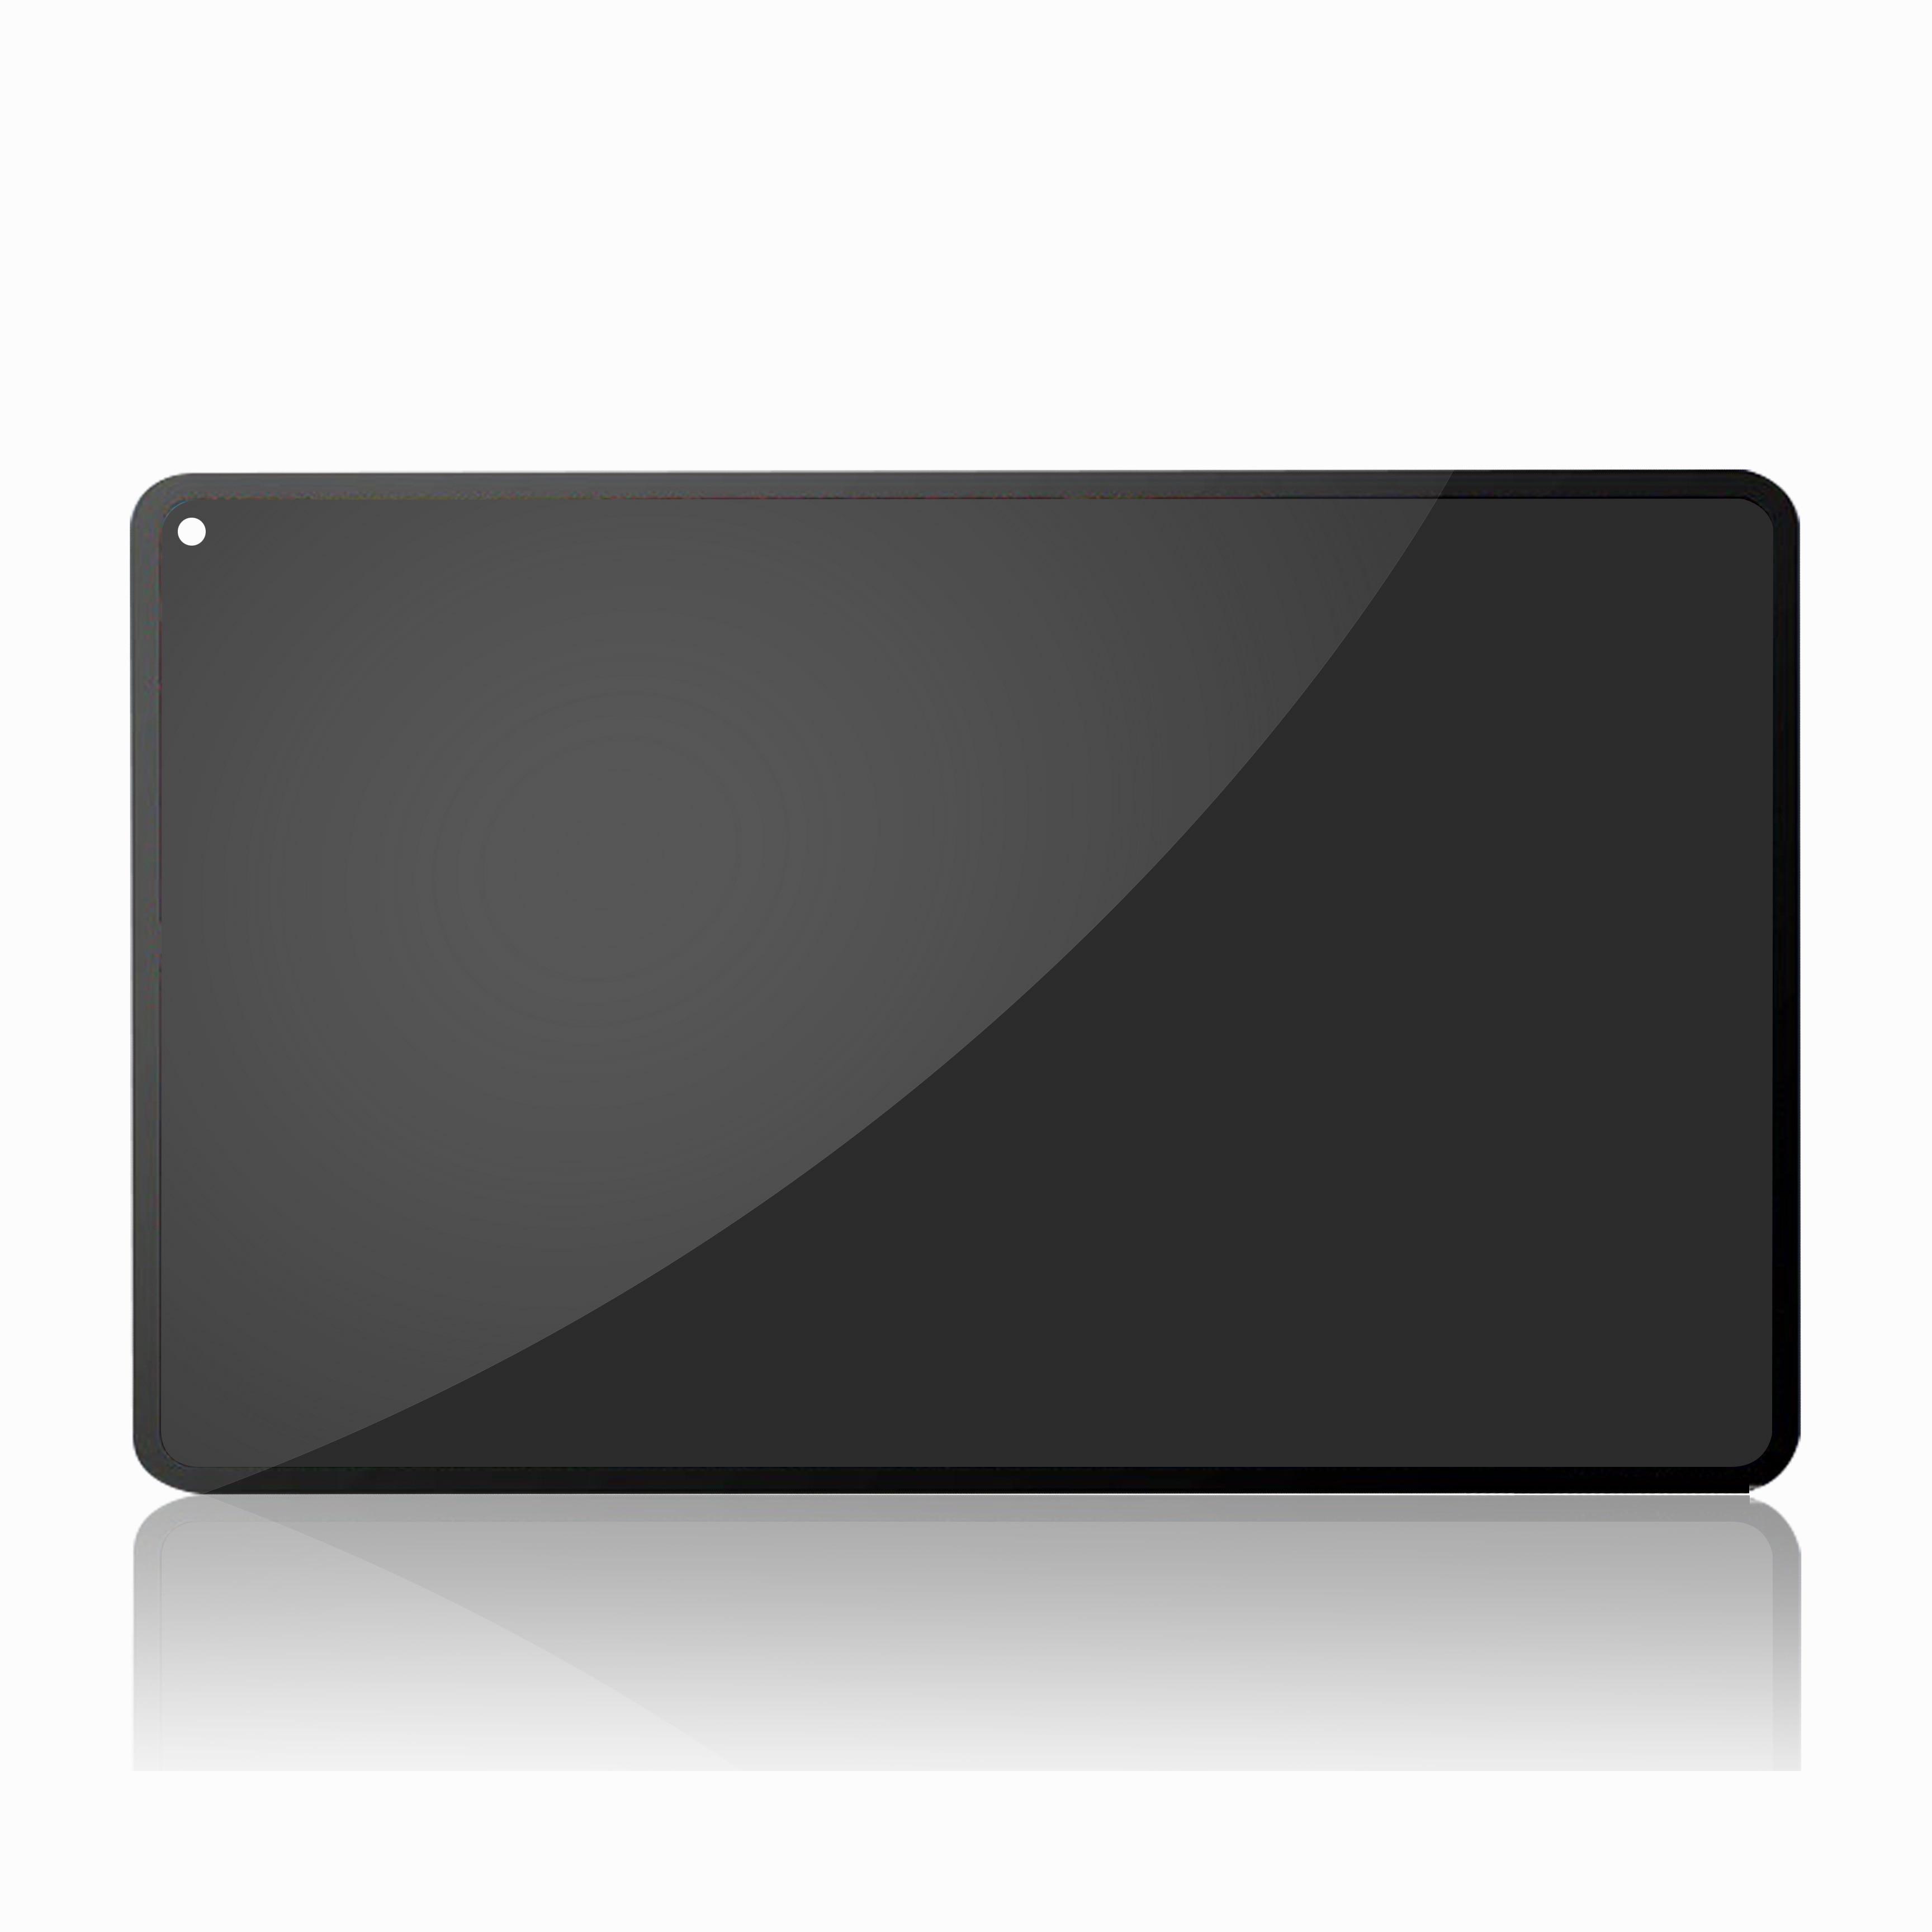 Originale 10.8 per Huawei Matepad Pro MRX W09 MRX W19 MRX AL19 MRX AL09 Display Lcd con Touch Screen Digitizer Assembly - 2